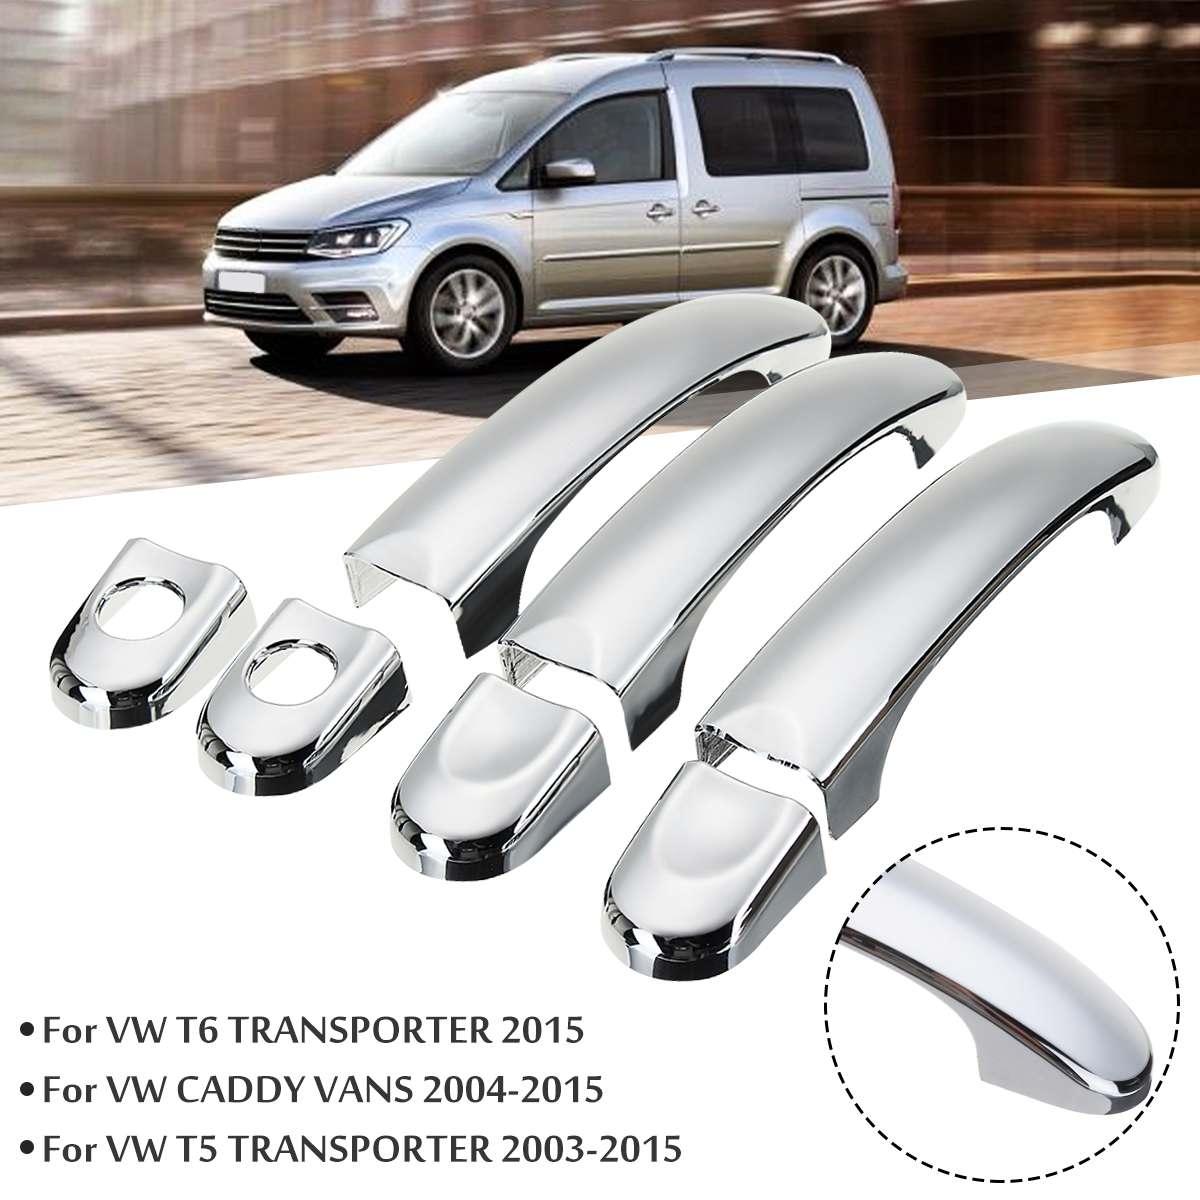 Para VW Transporter T5 Caddy 2001-2013 8x/7x/6x Auto Chrome puerta de acero inoxidable Set de cubiertas de manija